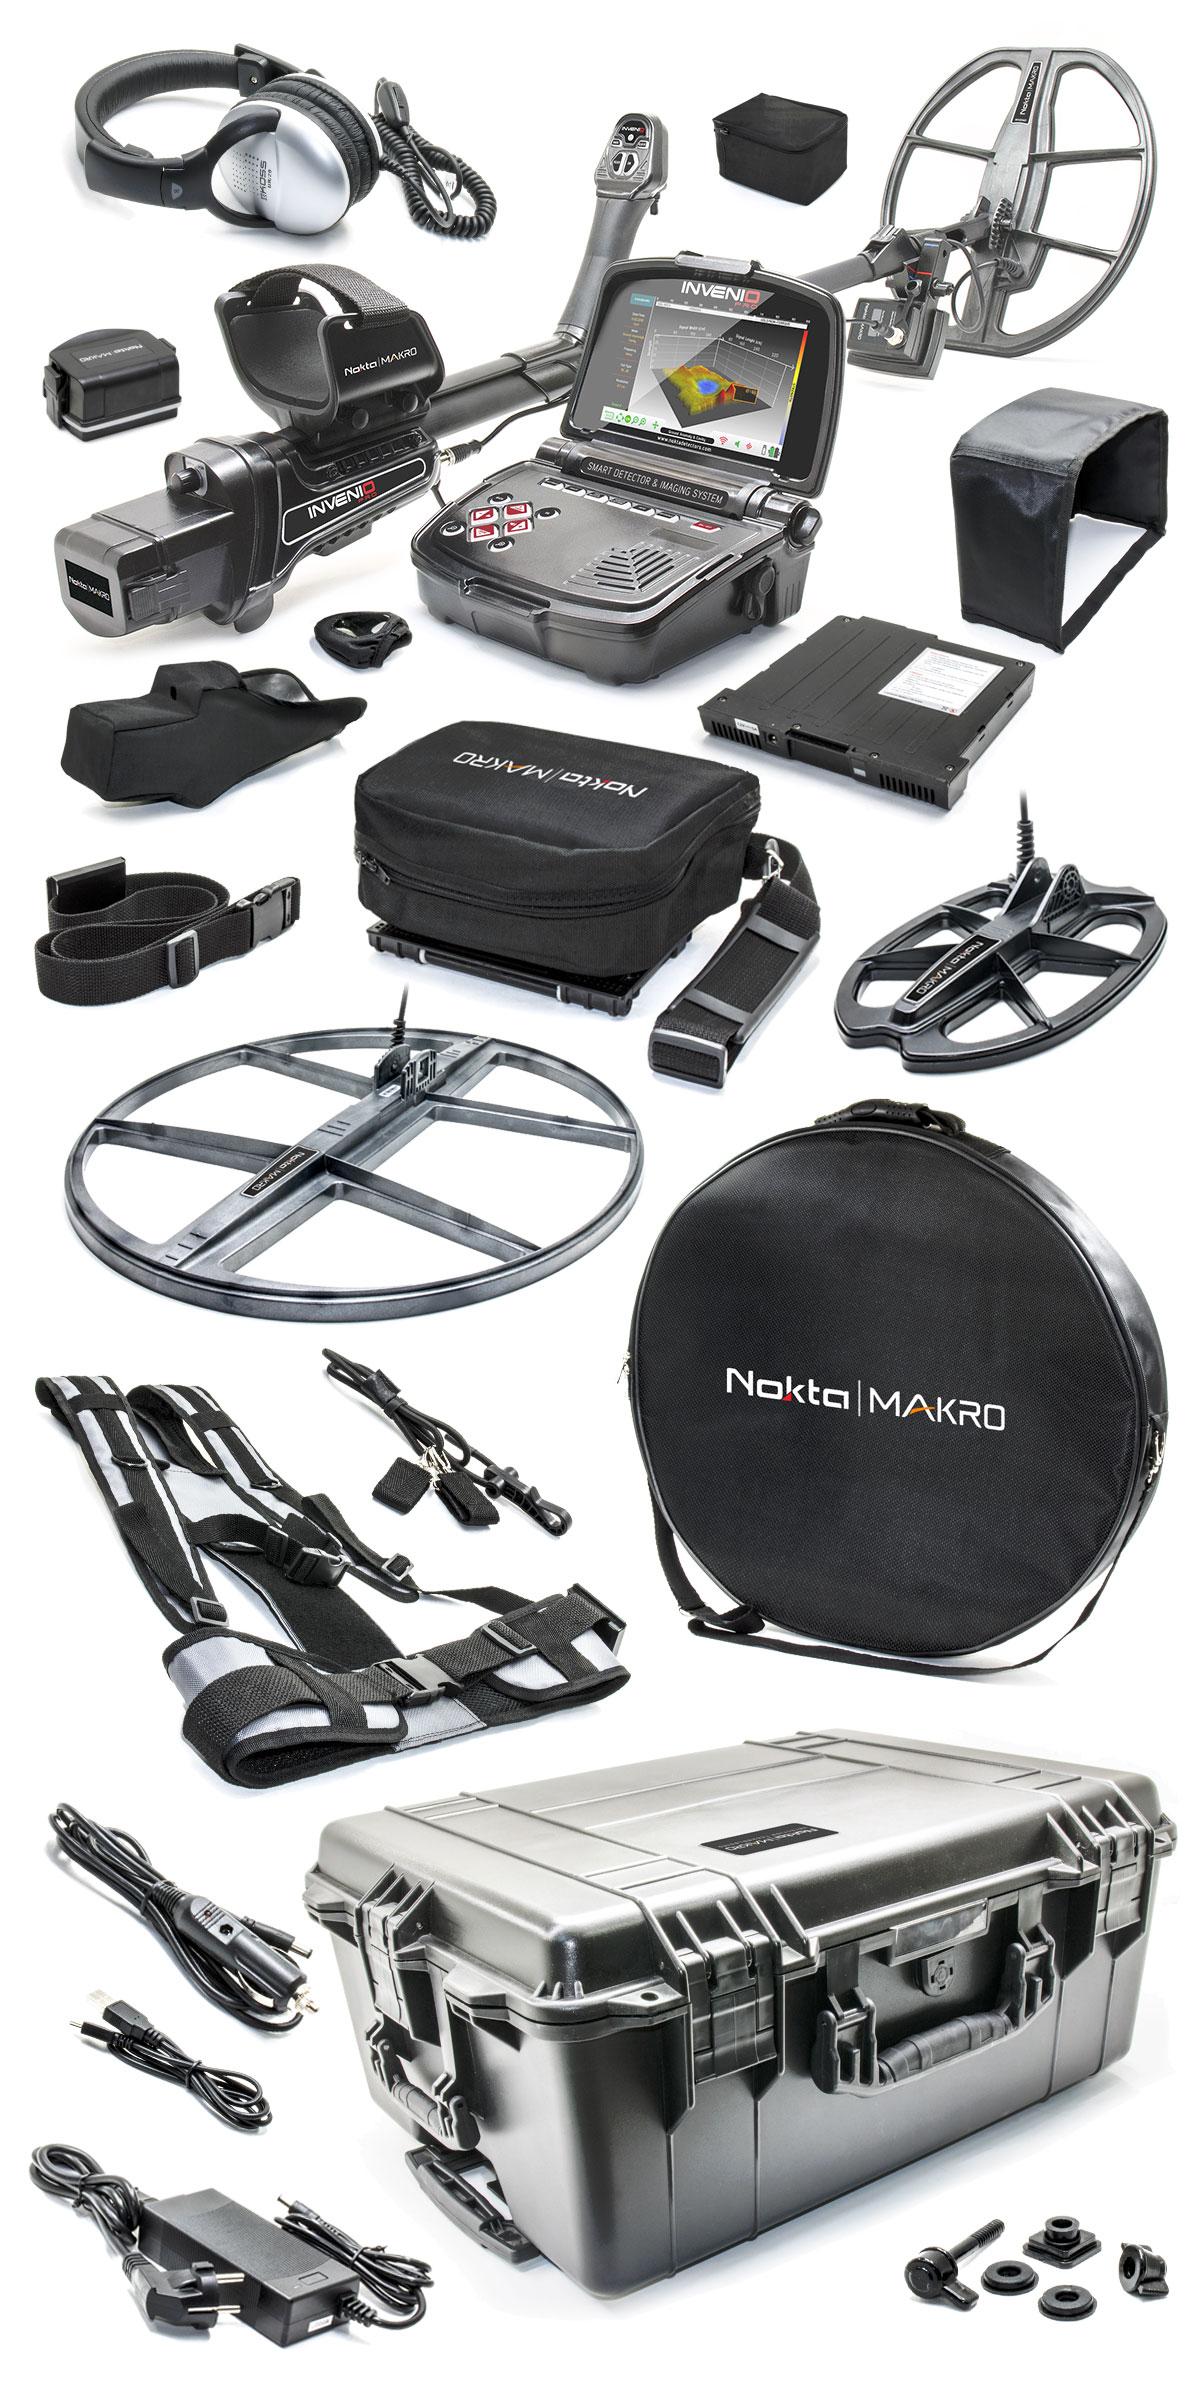 NOKTA & MAKRO Invenio Pro zestaw